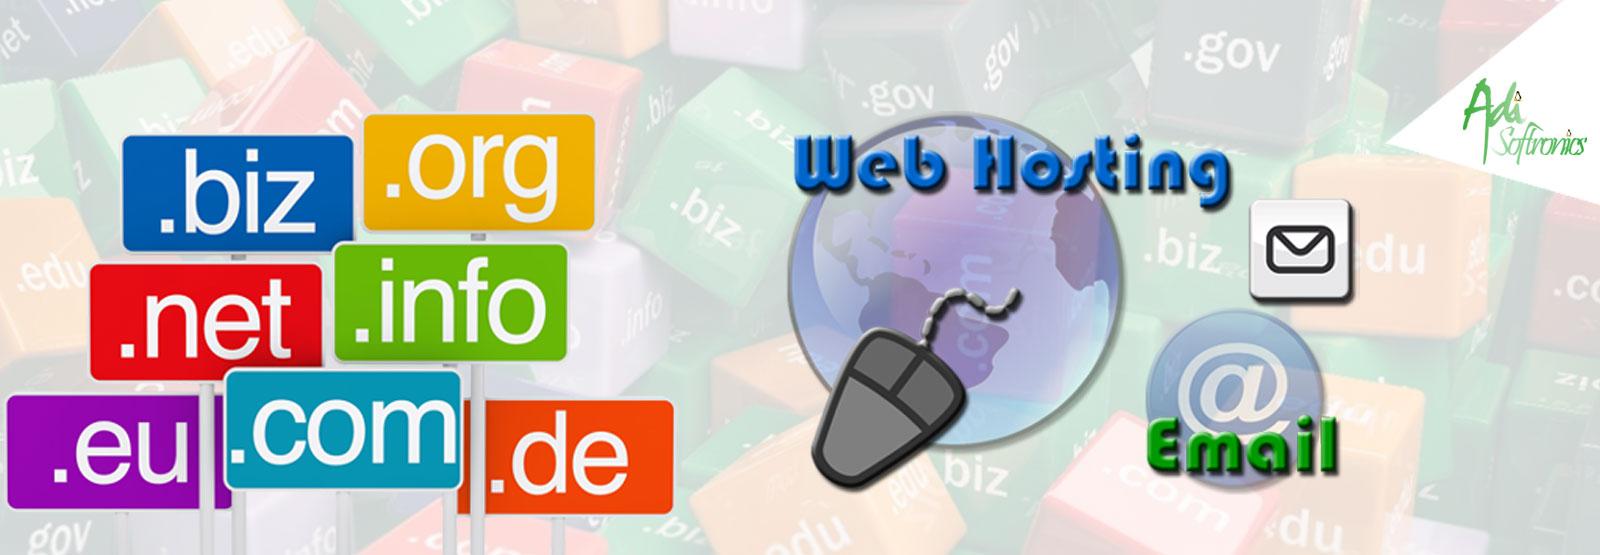 Name Registry - Adisoftronics Web Development Company In Delhi